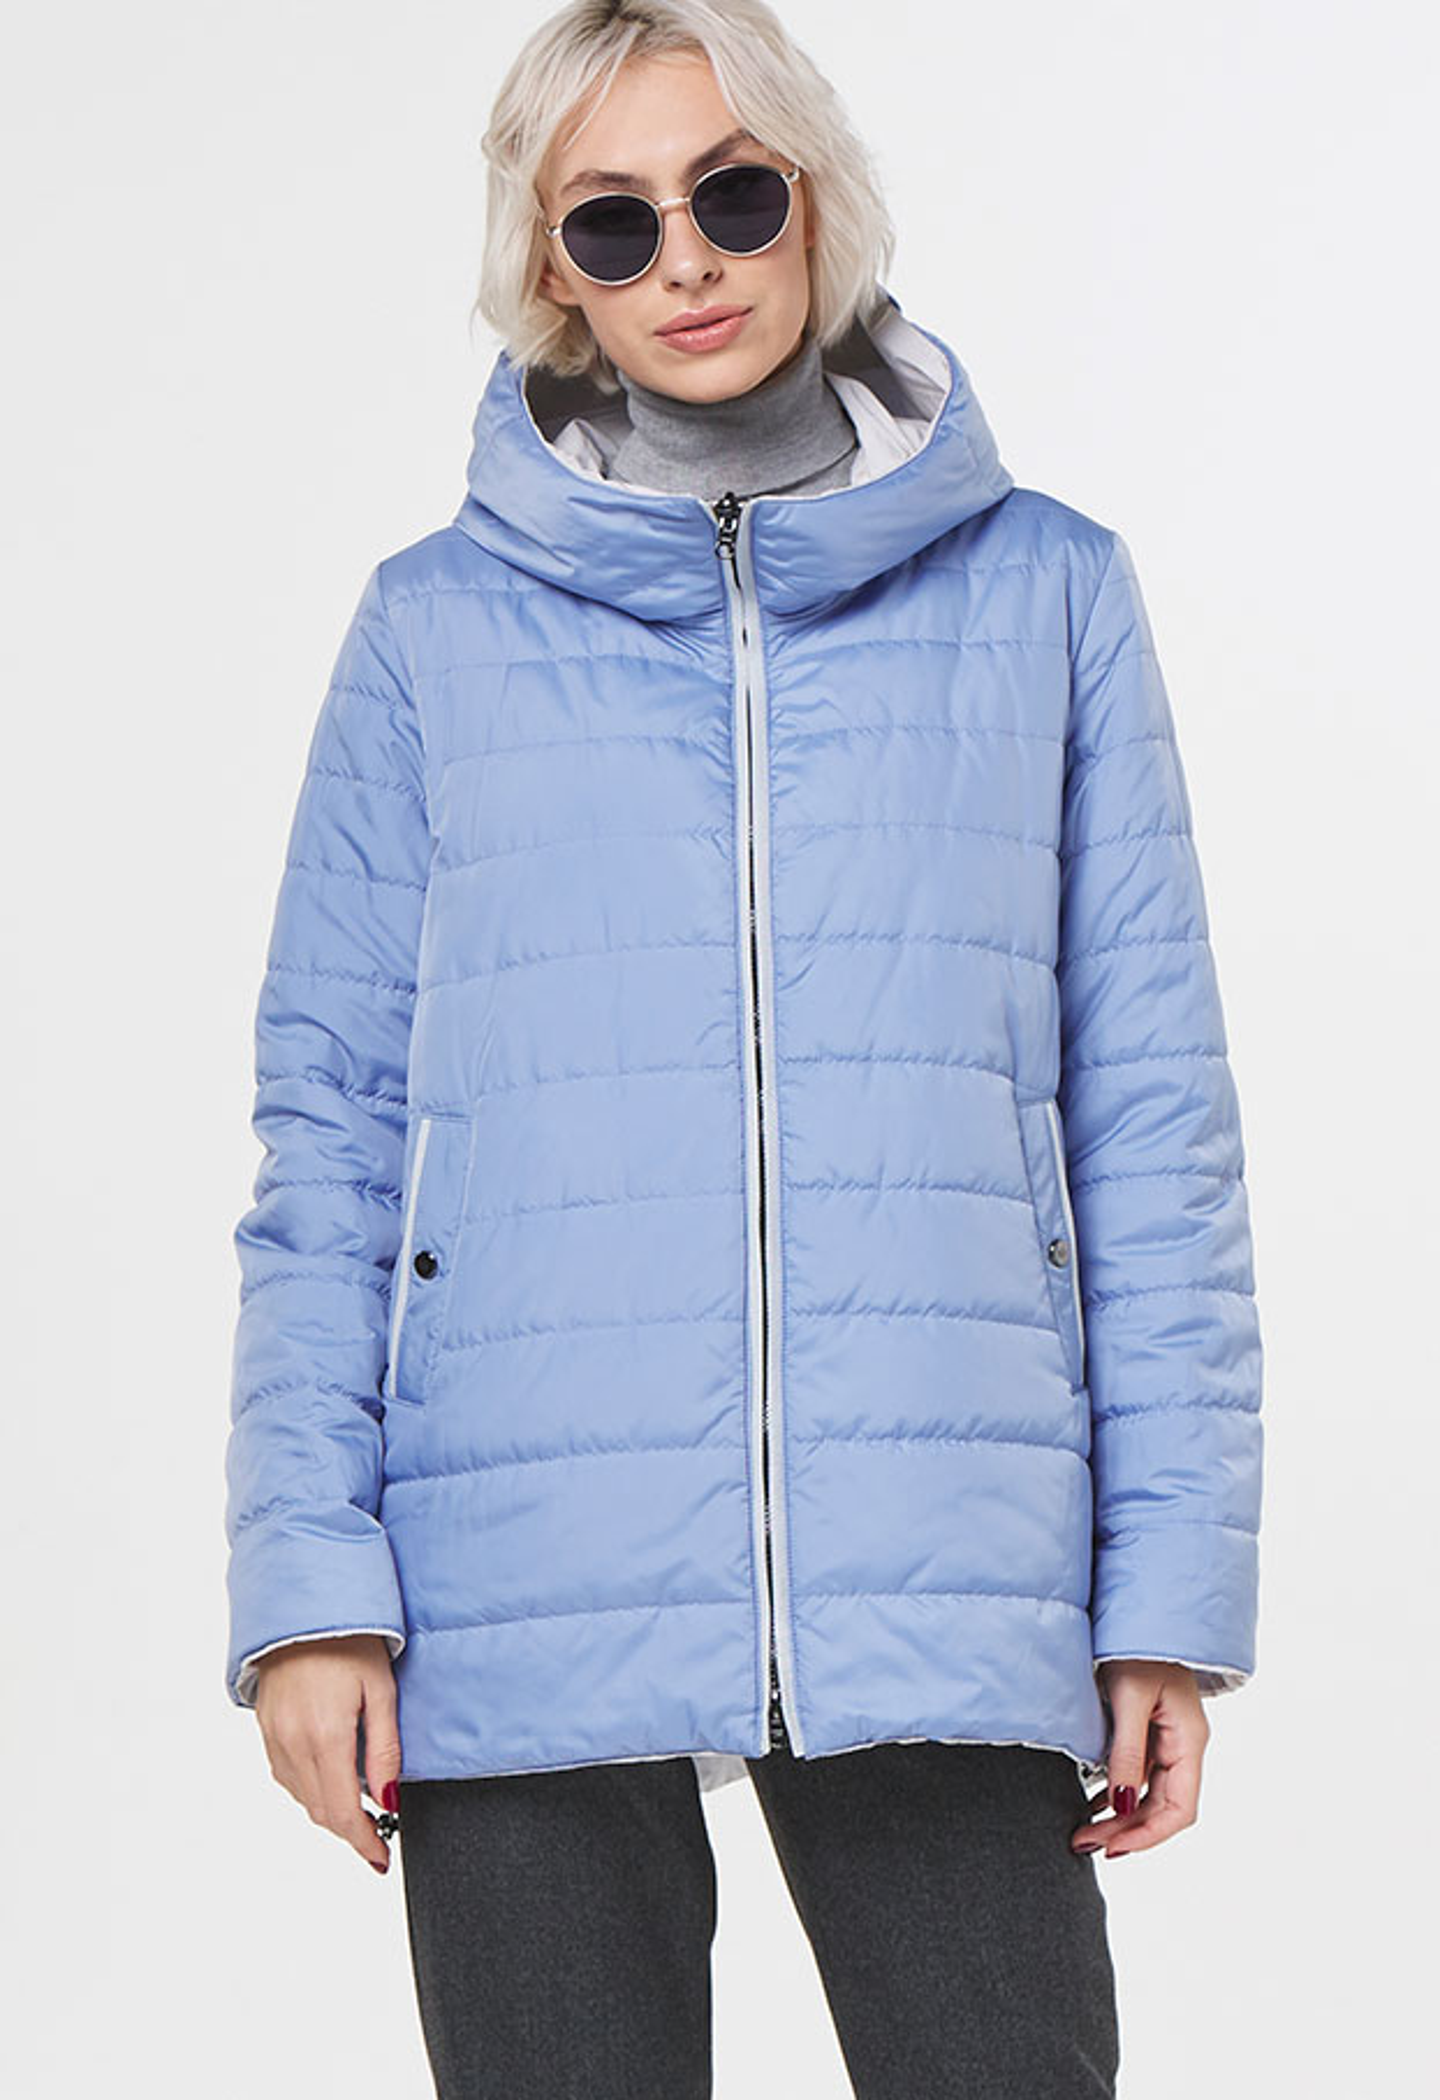 Куртка двухсторонняя Dixi Coat 4400-115 (42/21)